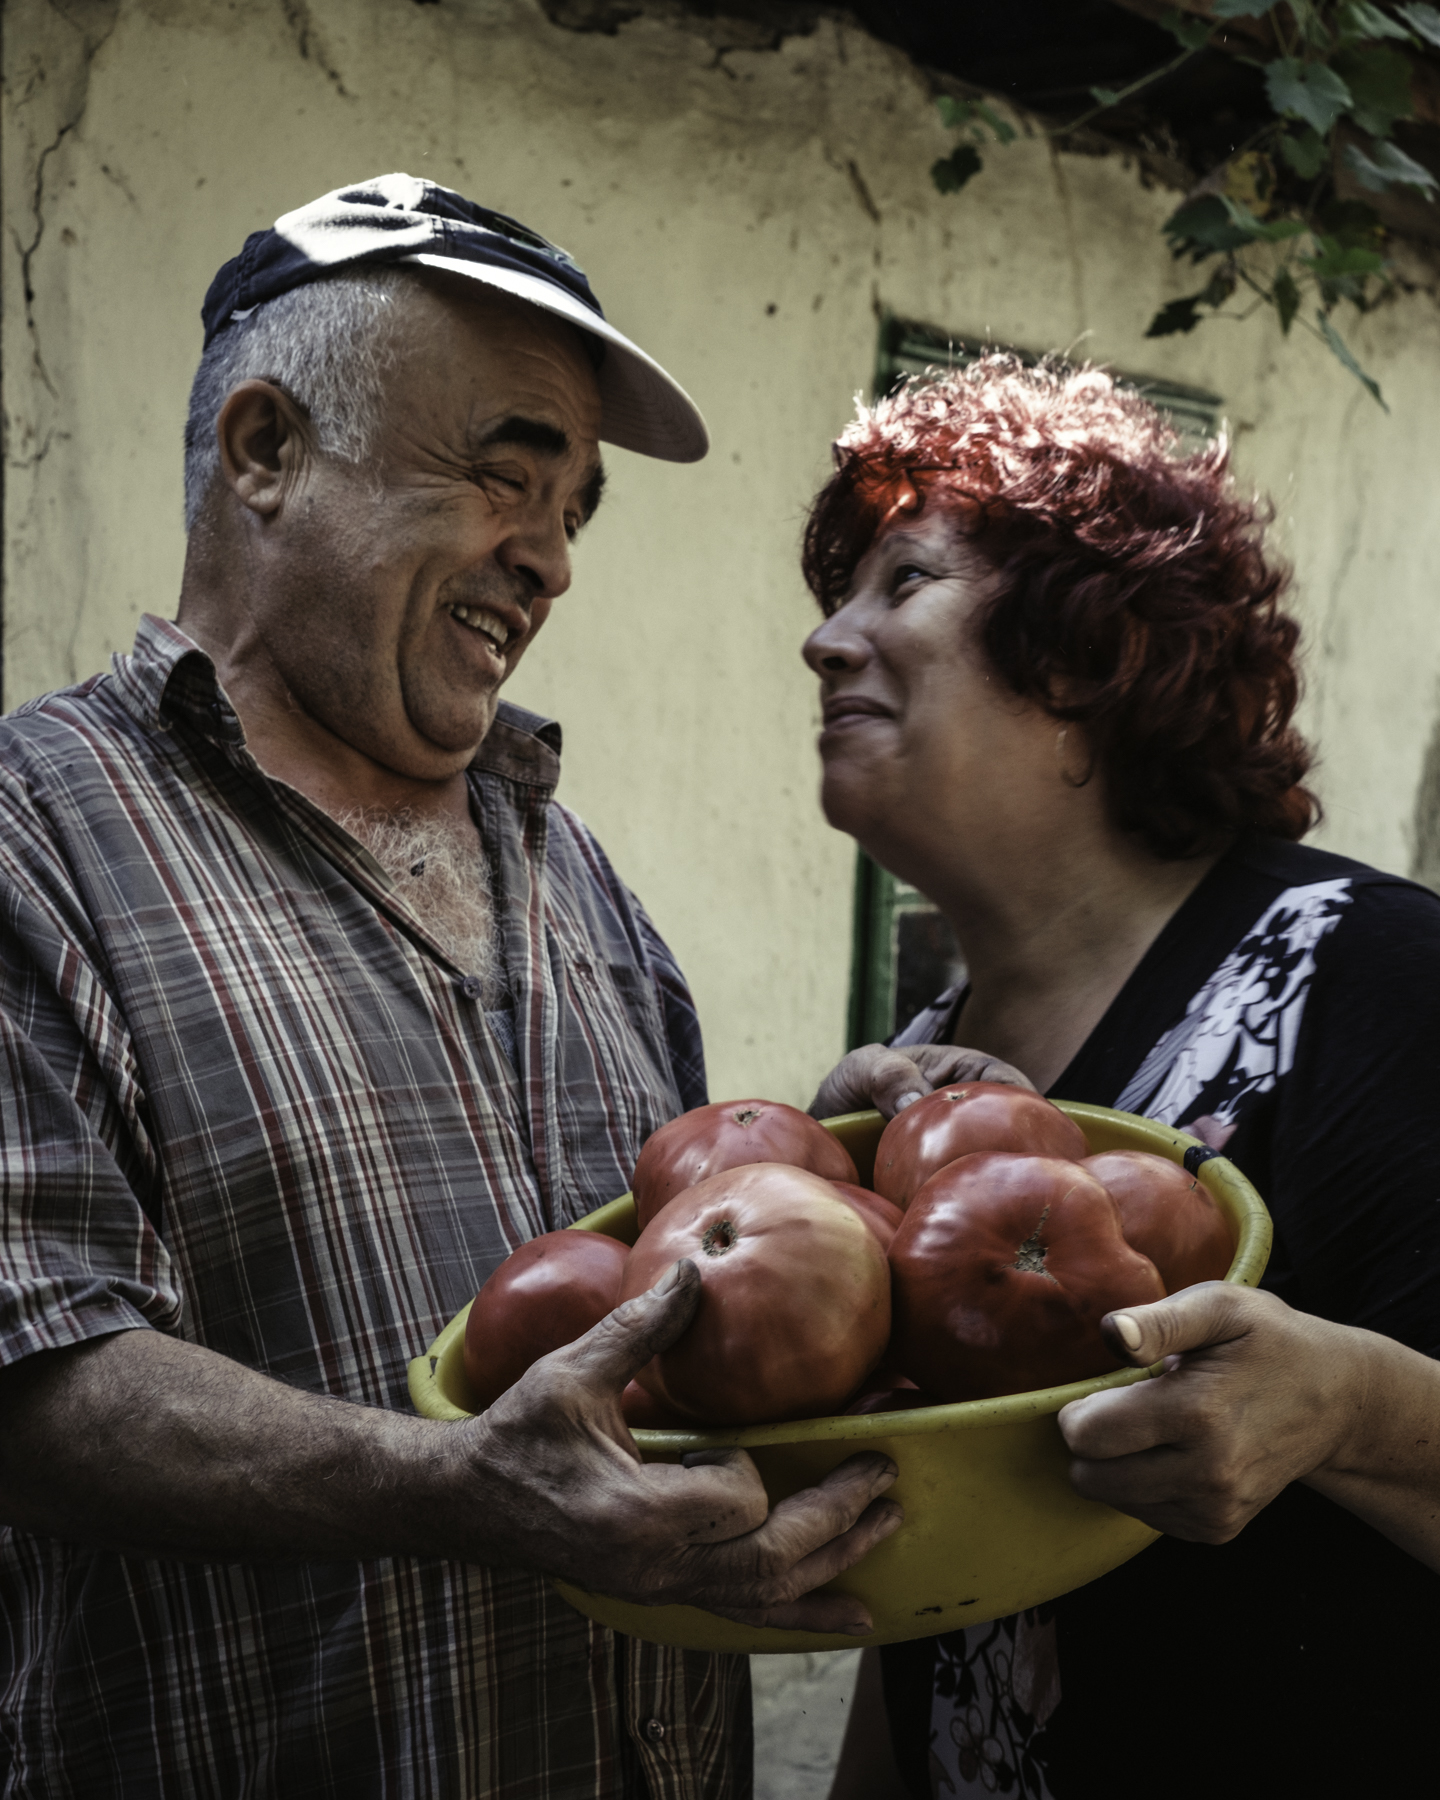 Market Gardeners, Mindya, Bulgaria